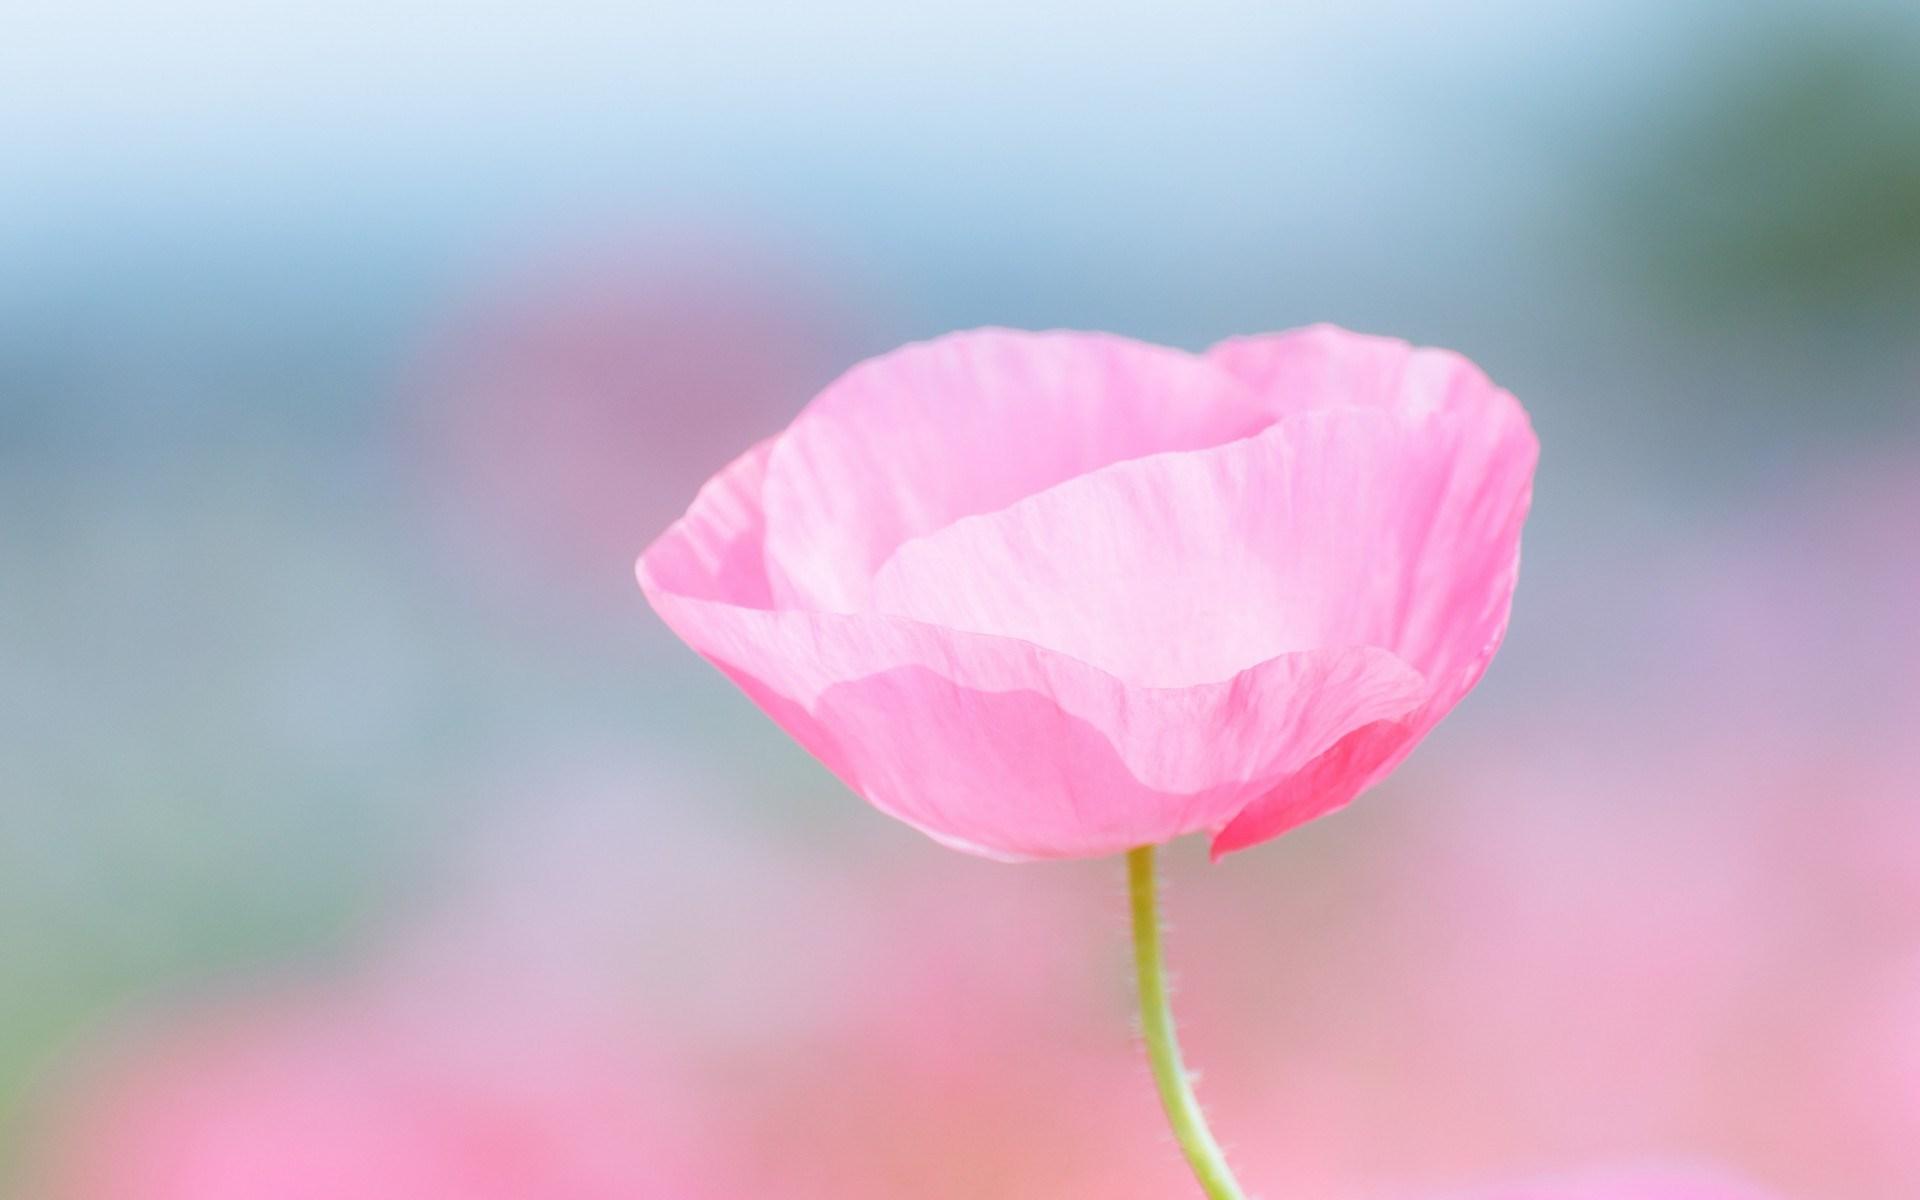 Poppy Pink Flower Field Close Up Blurred 1920 X 1200